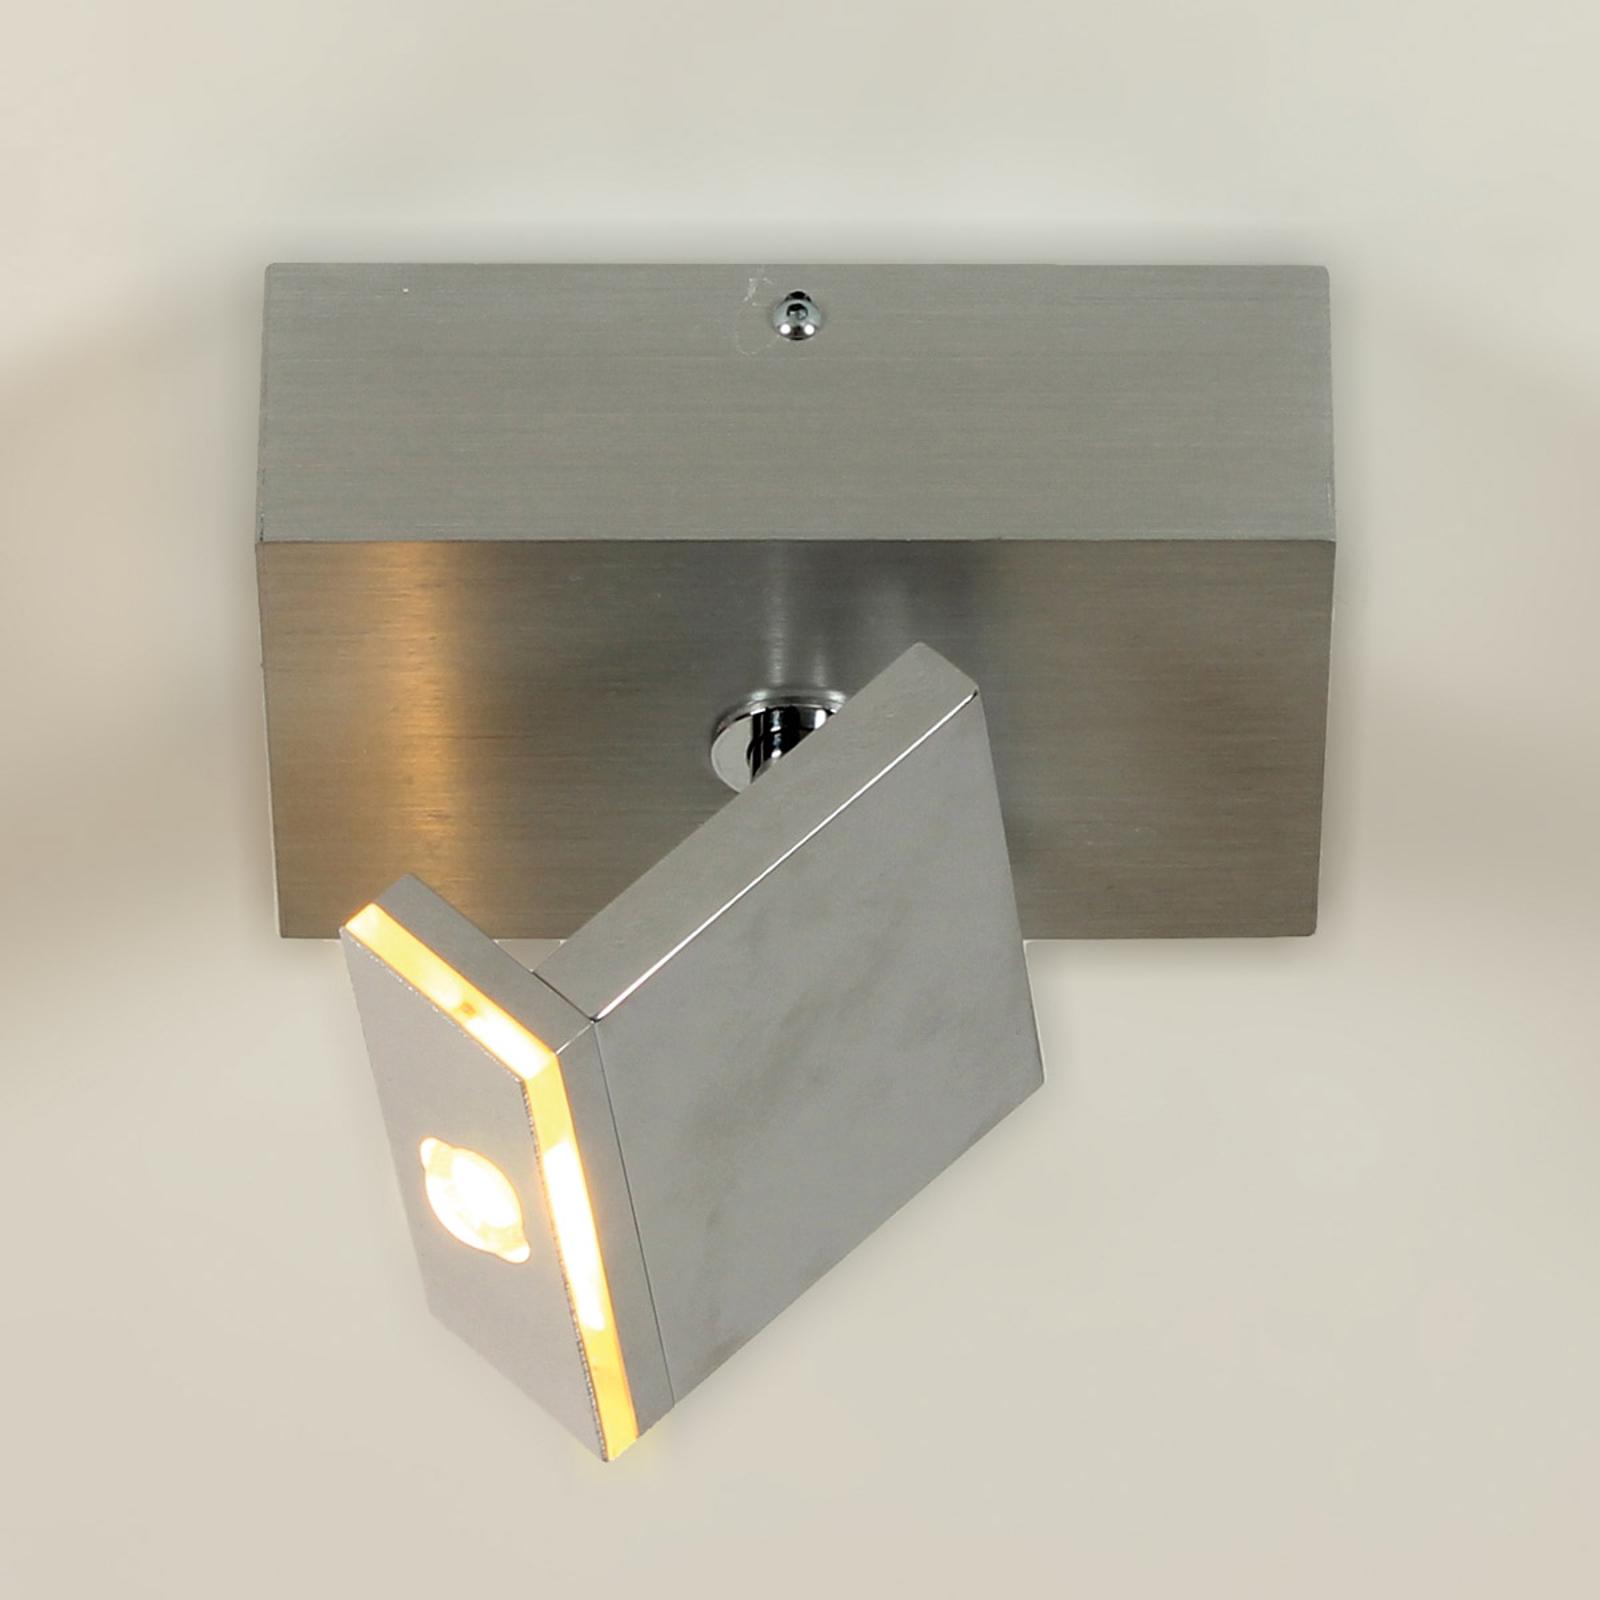 Kleine LED-plafondspot Elle, kantelbaar en dimbaar